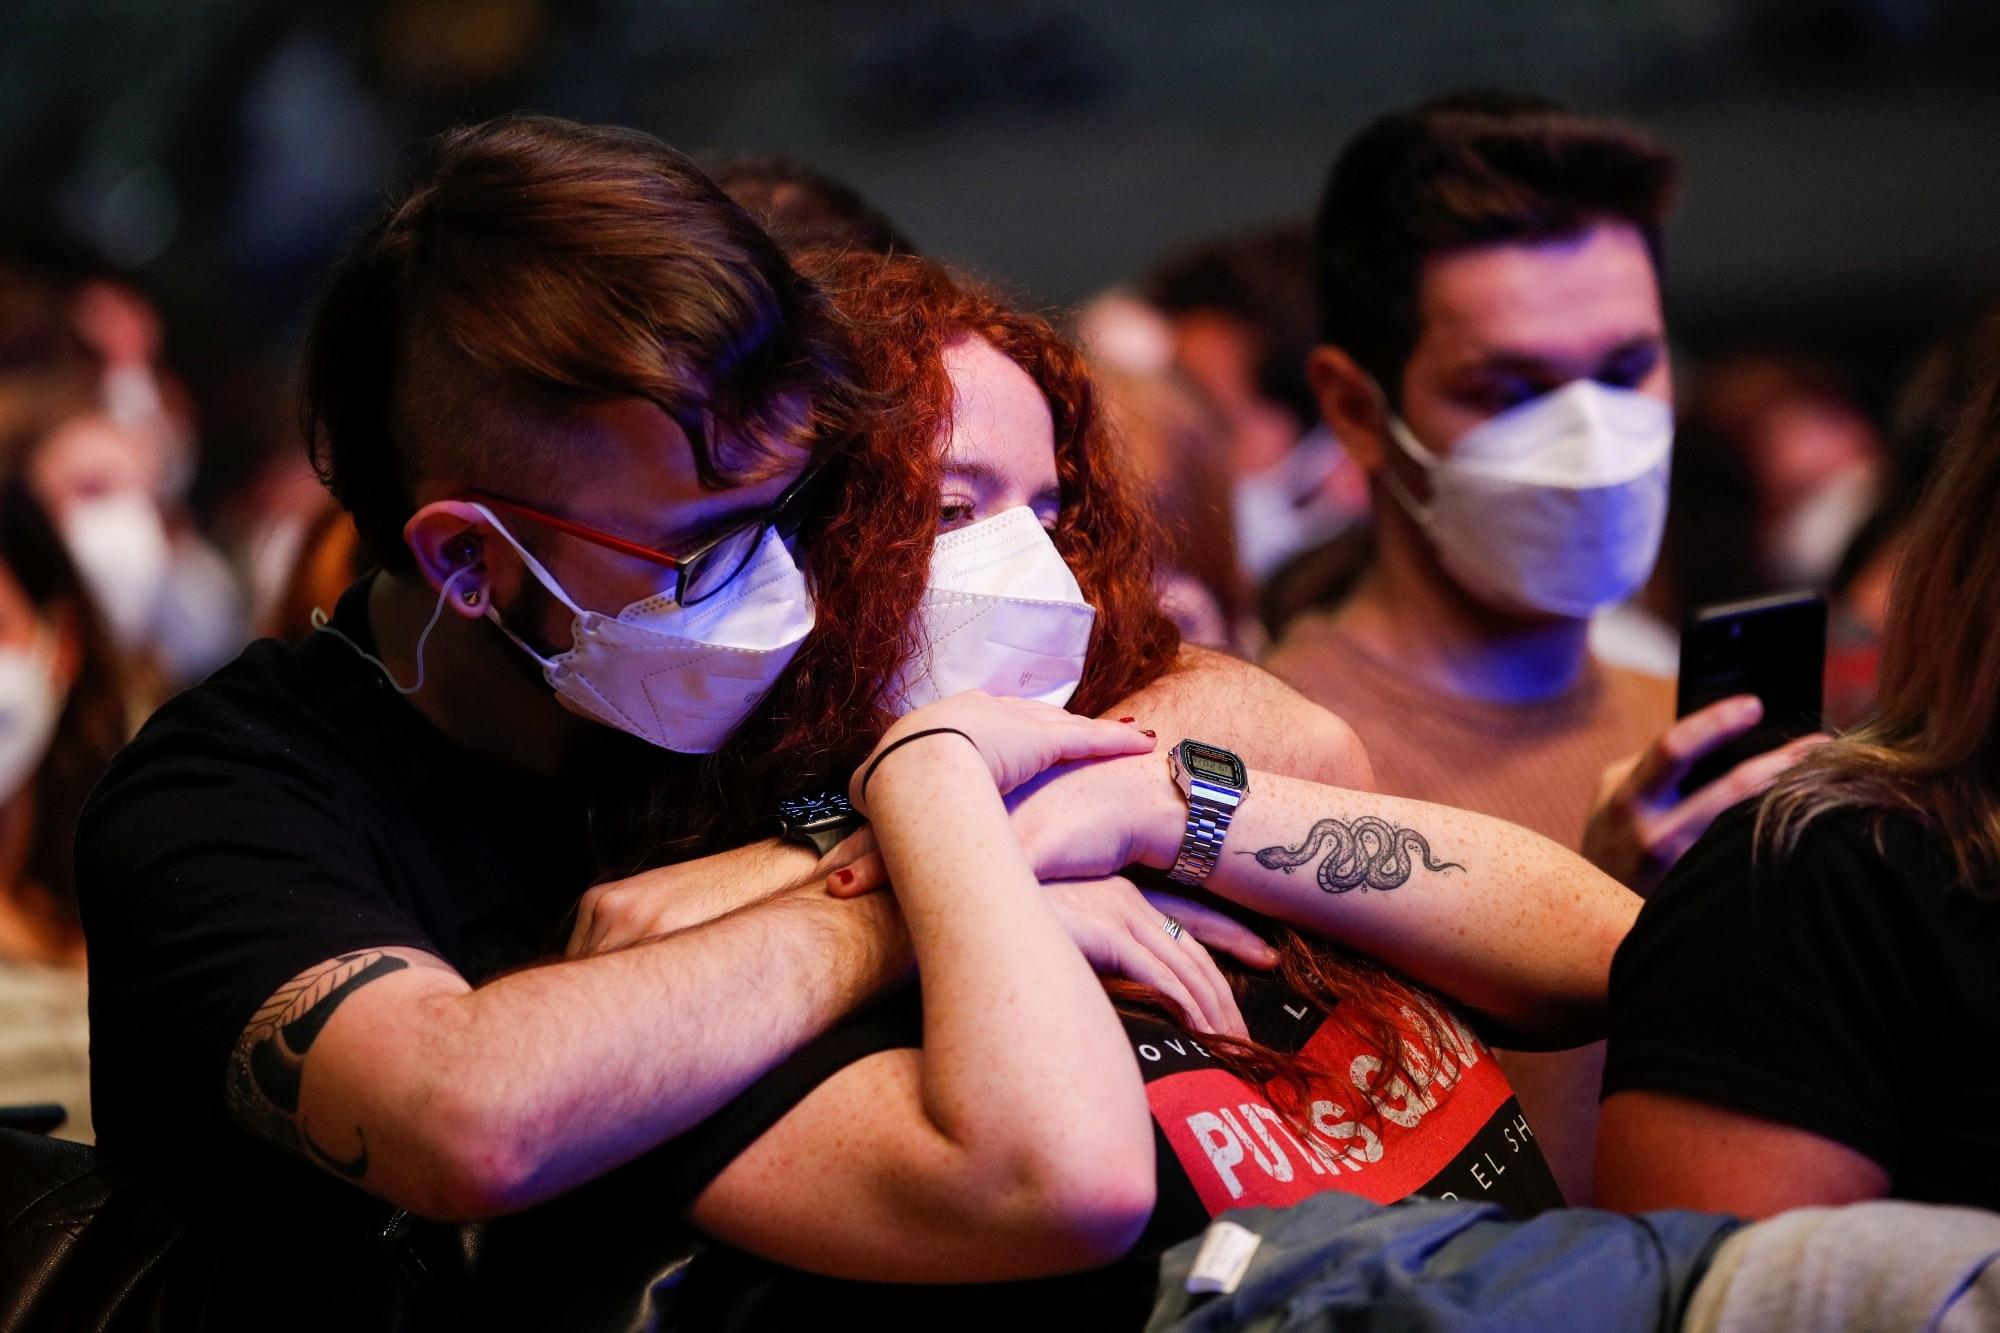 Koncert Love of Lesbian v Barceloně